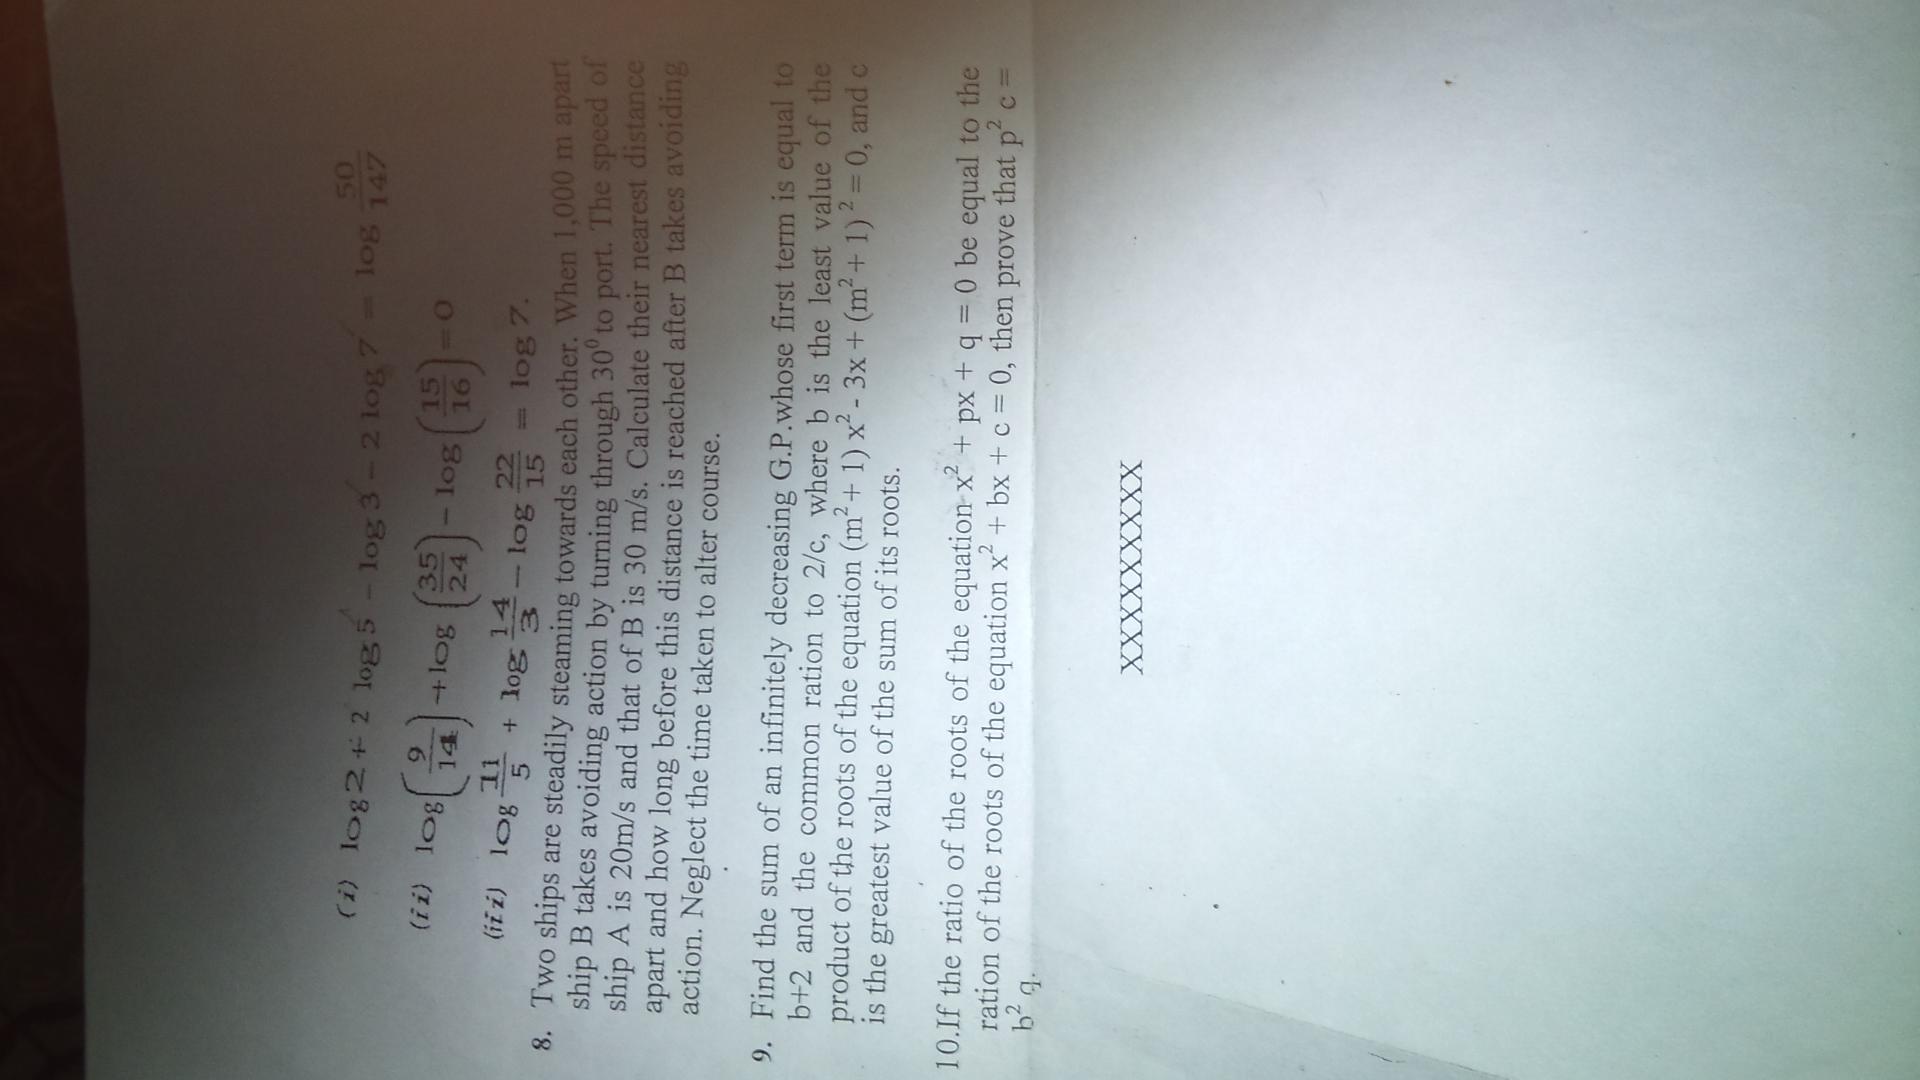 Vels University M E O Class 4 EXAMINATION OF MARINE ENGINEER